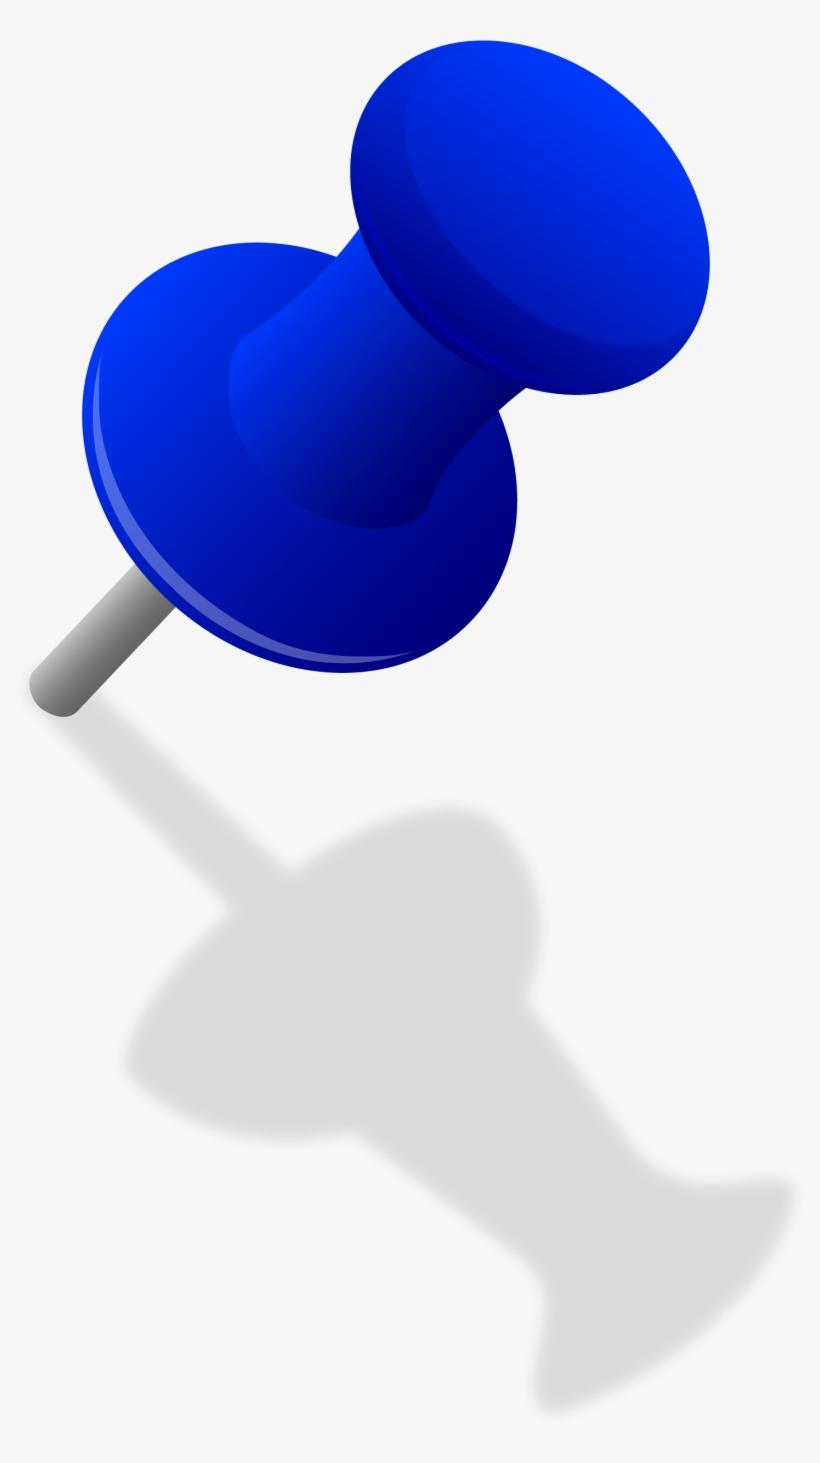 Pin clipart tac. Push clip art thumb